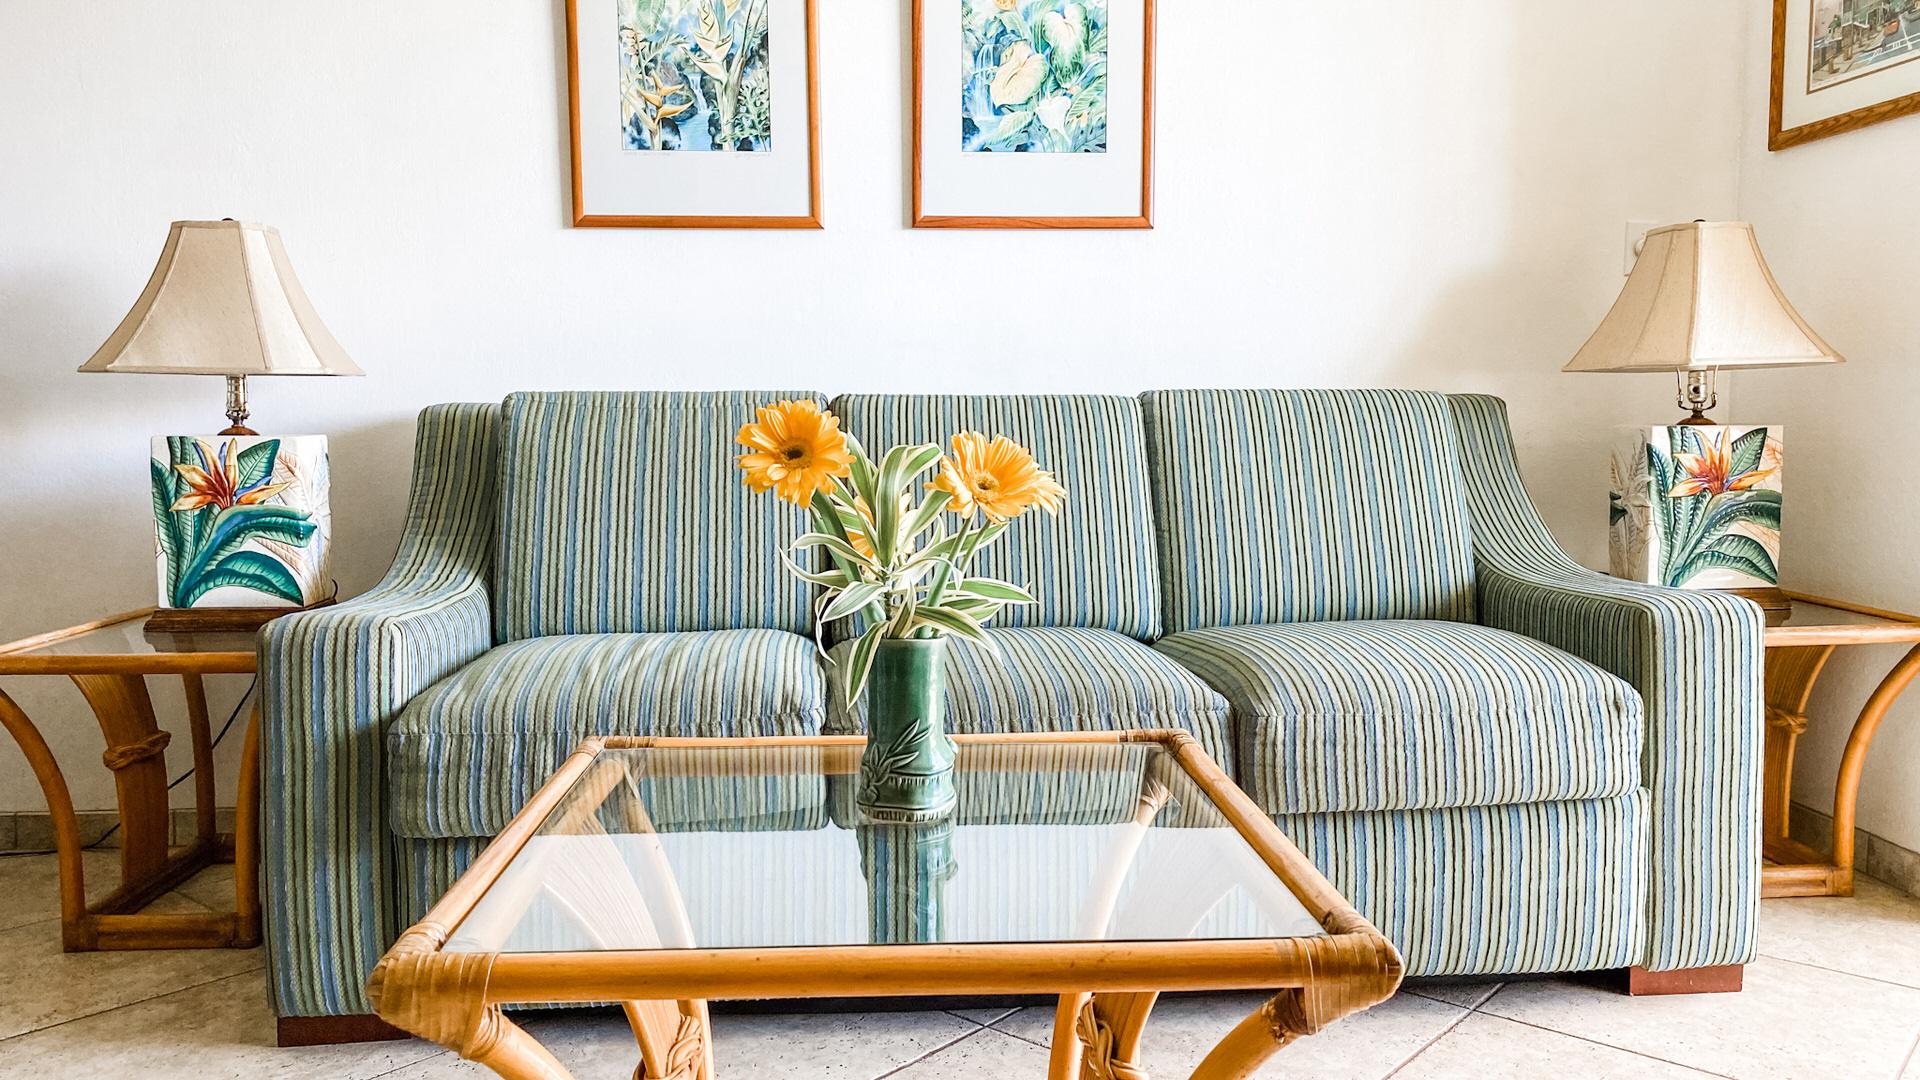 B207 Sofa and Coffee Table